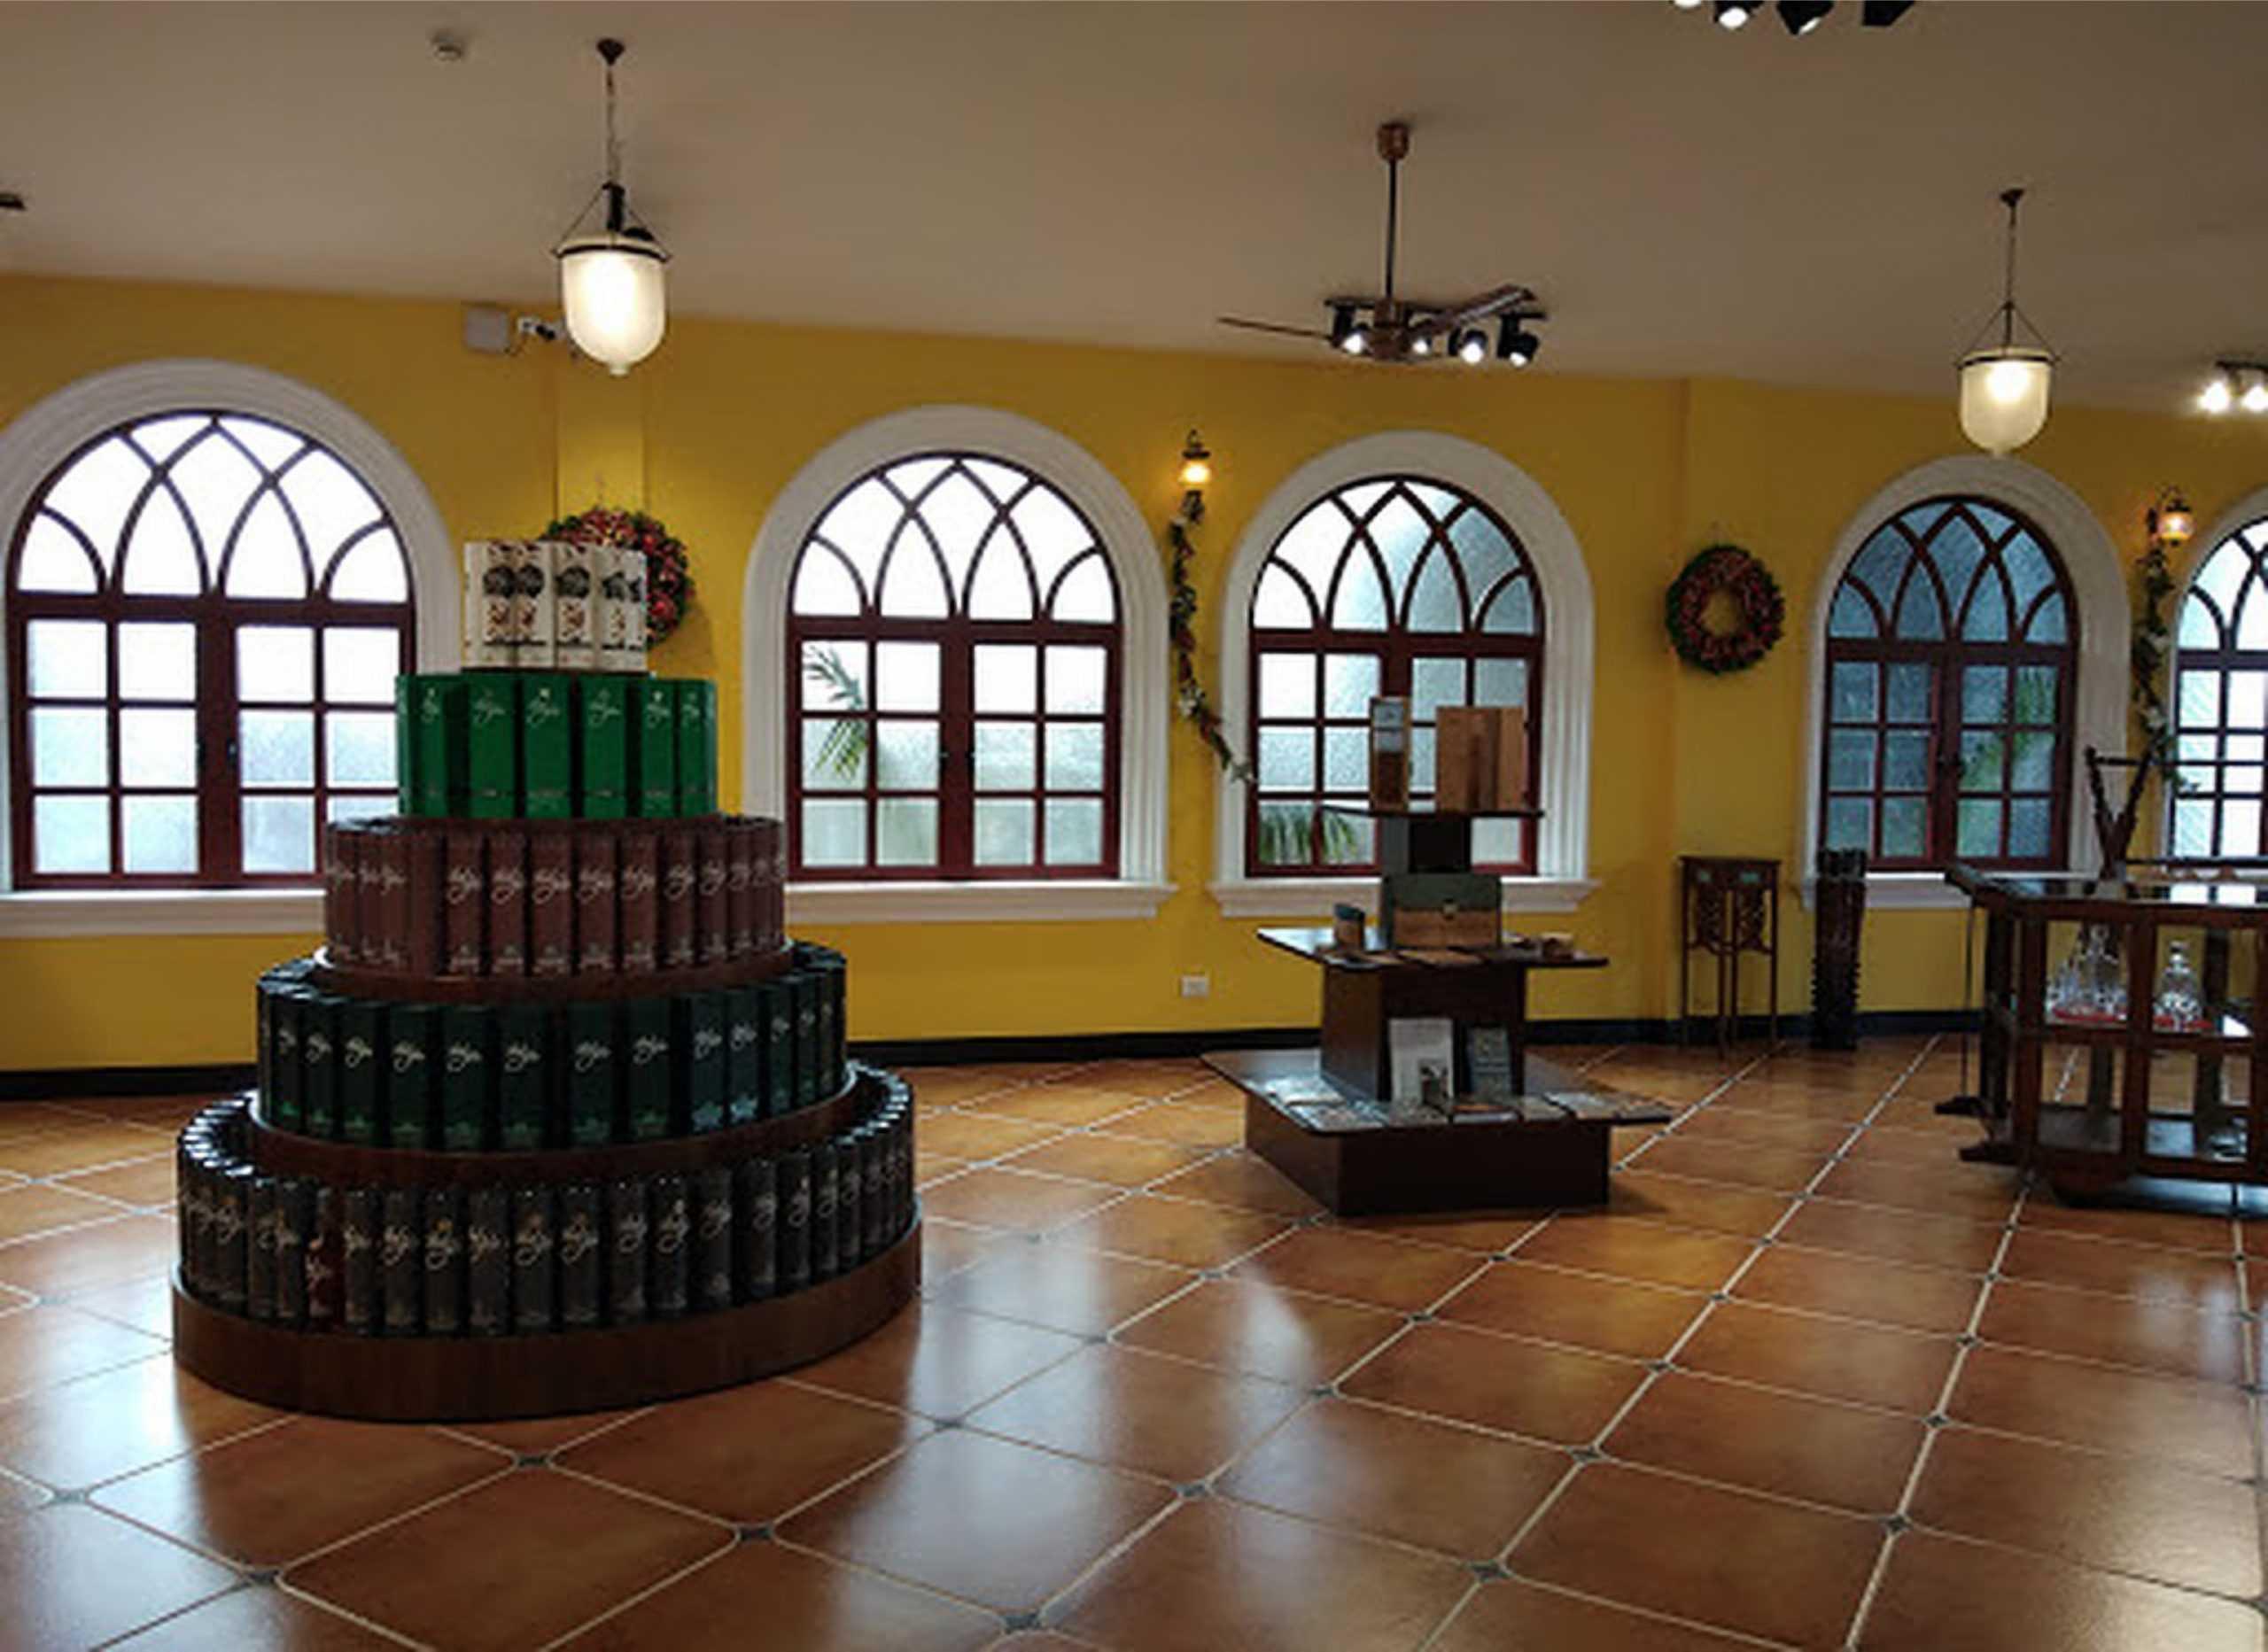 Rekai Design Interior John Distilleries, Goa-India M 21, Cuncolim Industrial Area., Cuncolim, Goa 403703, India M 21, Cuncolim Industrial Area., Cuncolim, Goa 403703, India Rekai-Design-Interior-John-Distilleries-Goa-India   113272